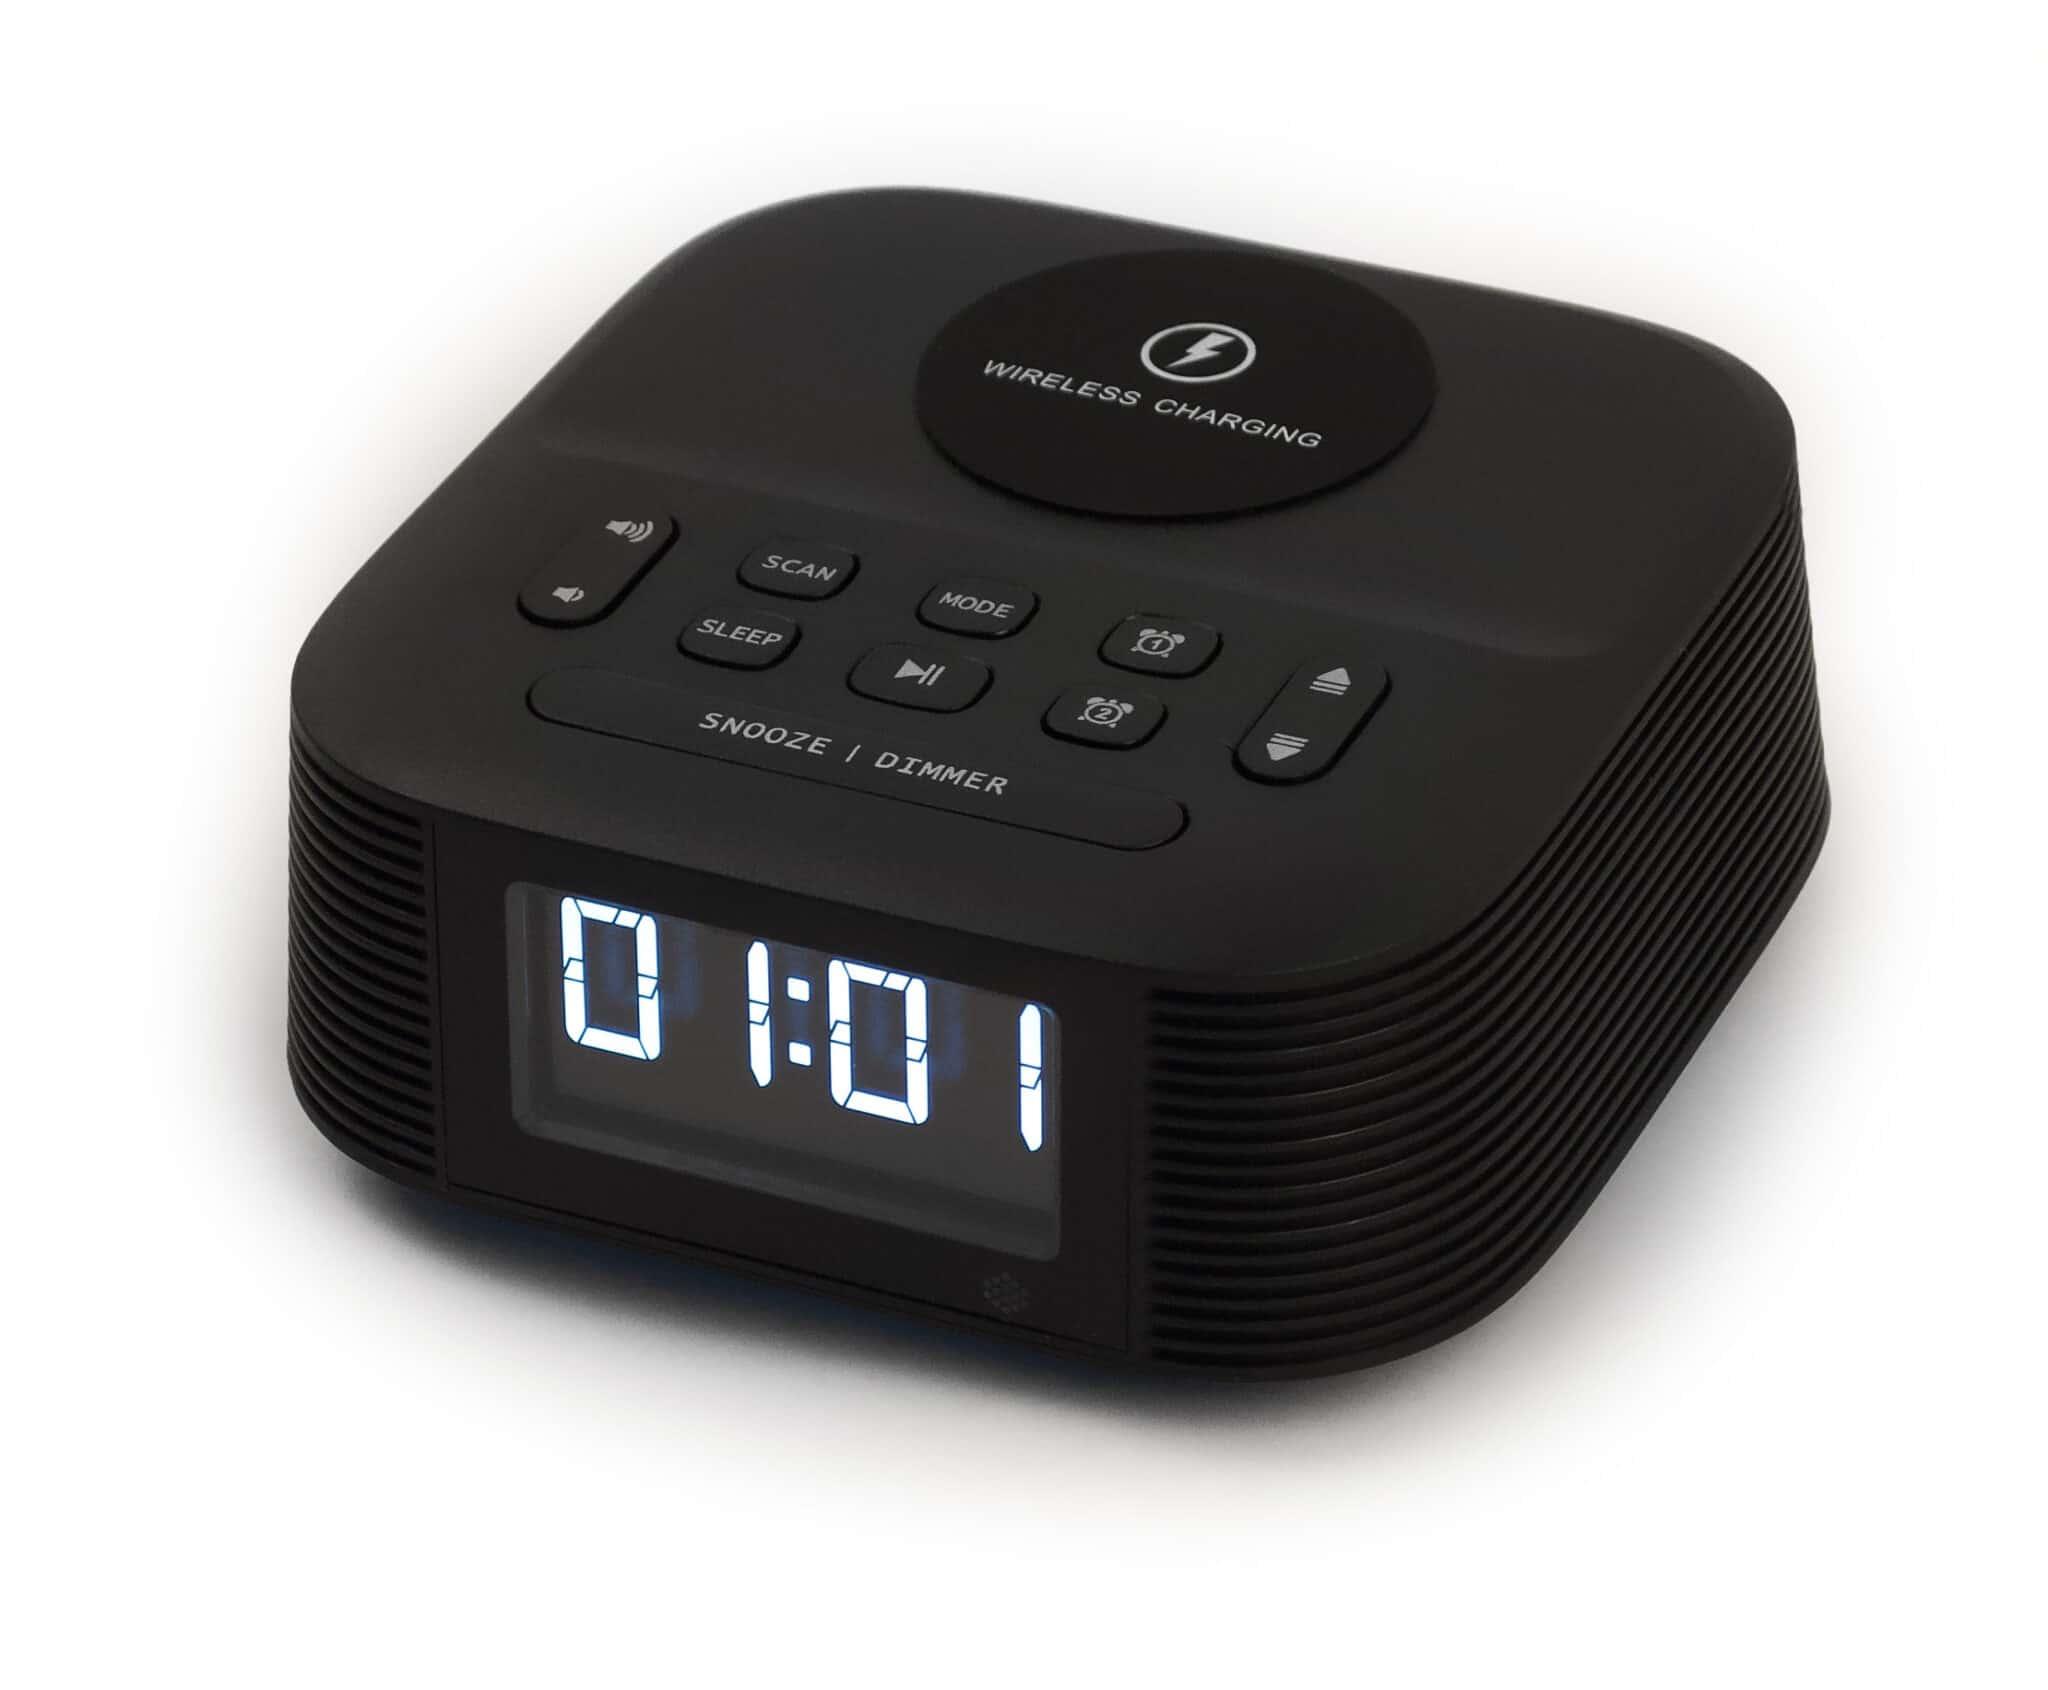 D8qi-device-bwstandard